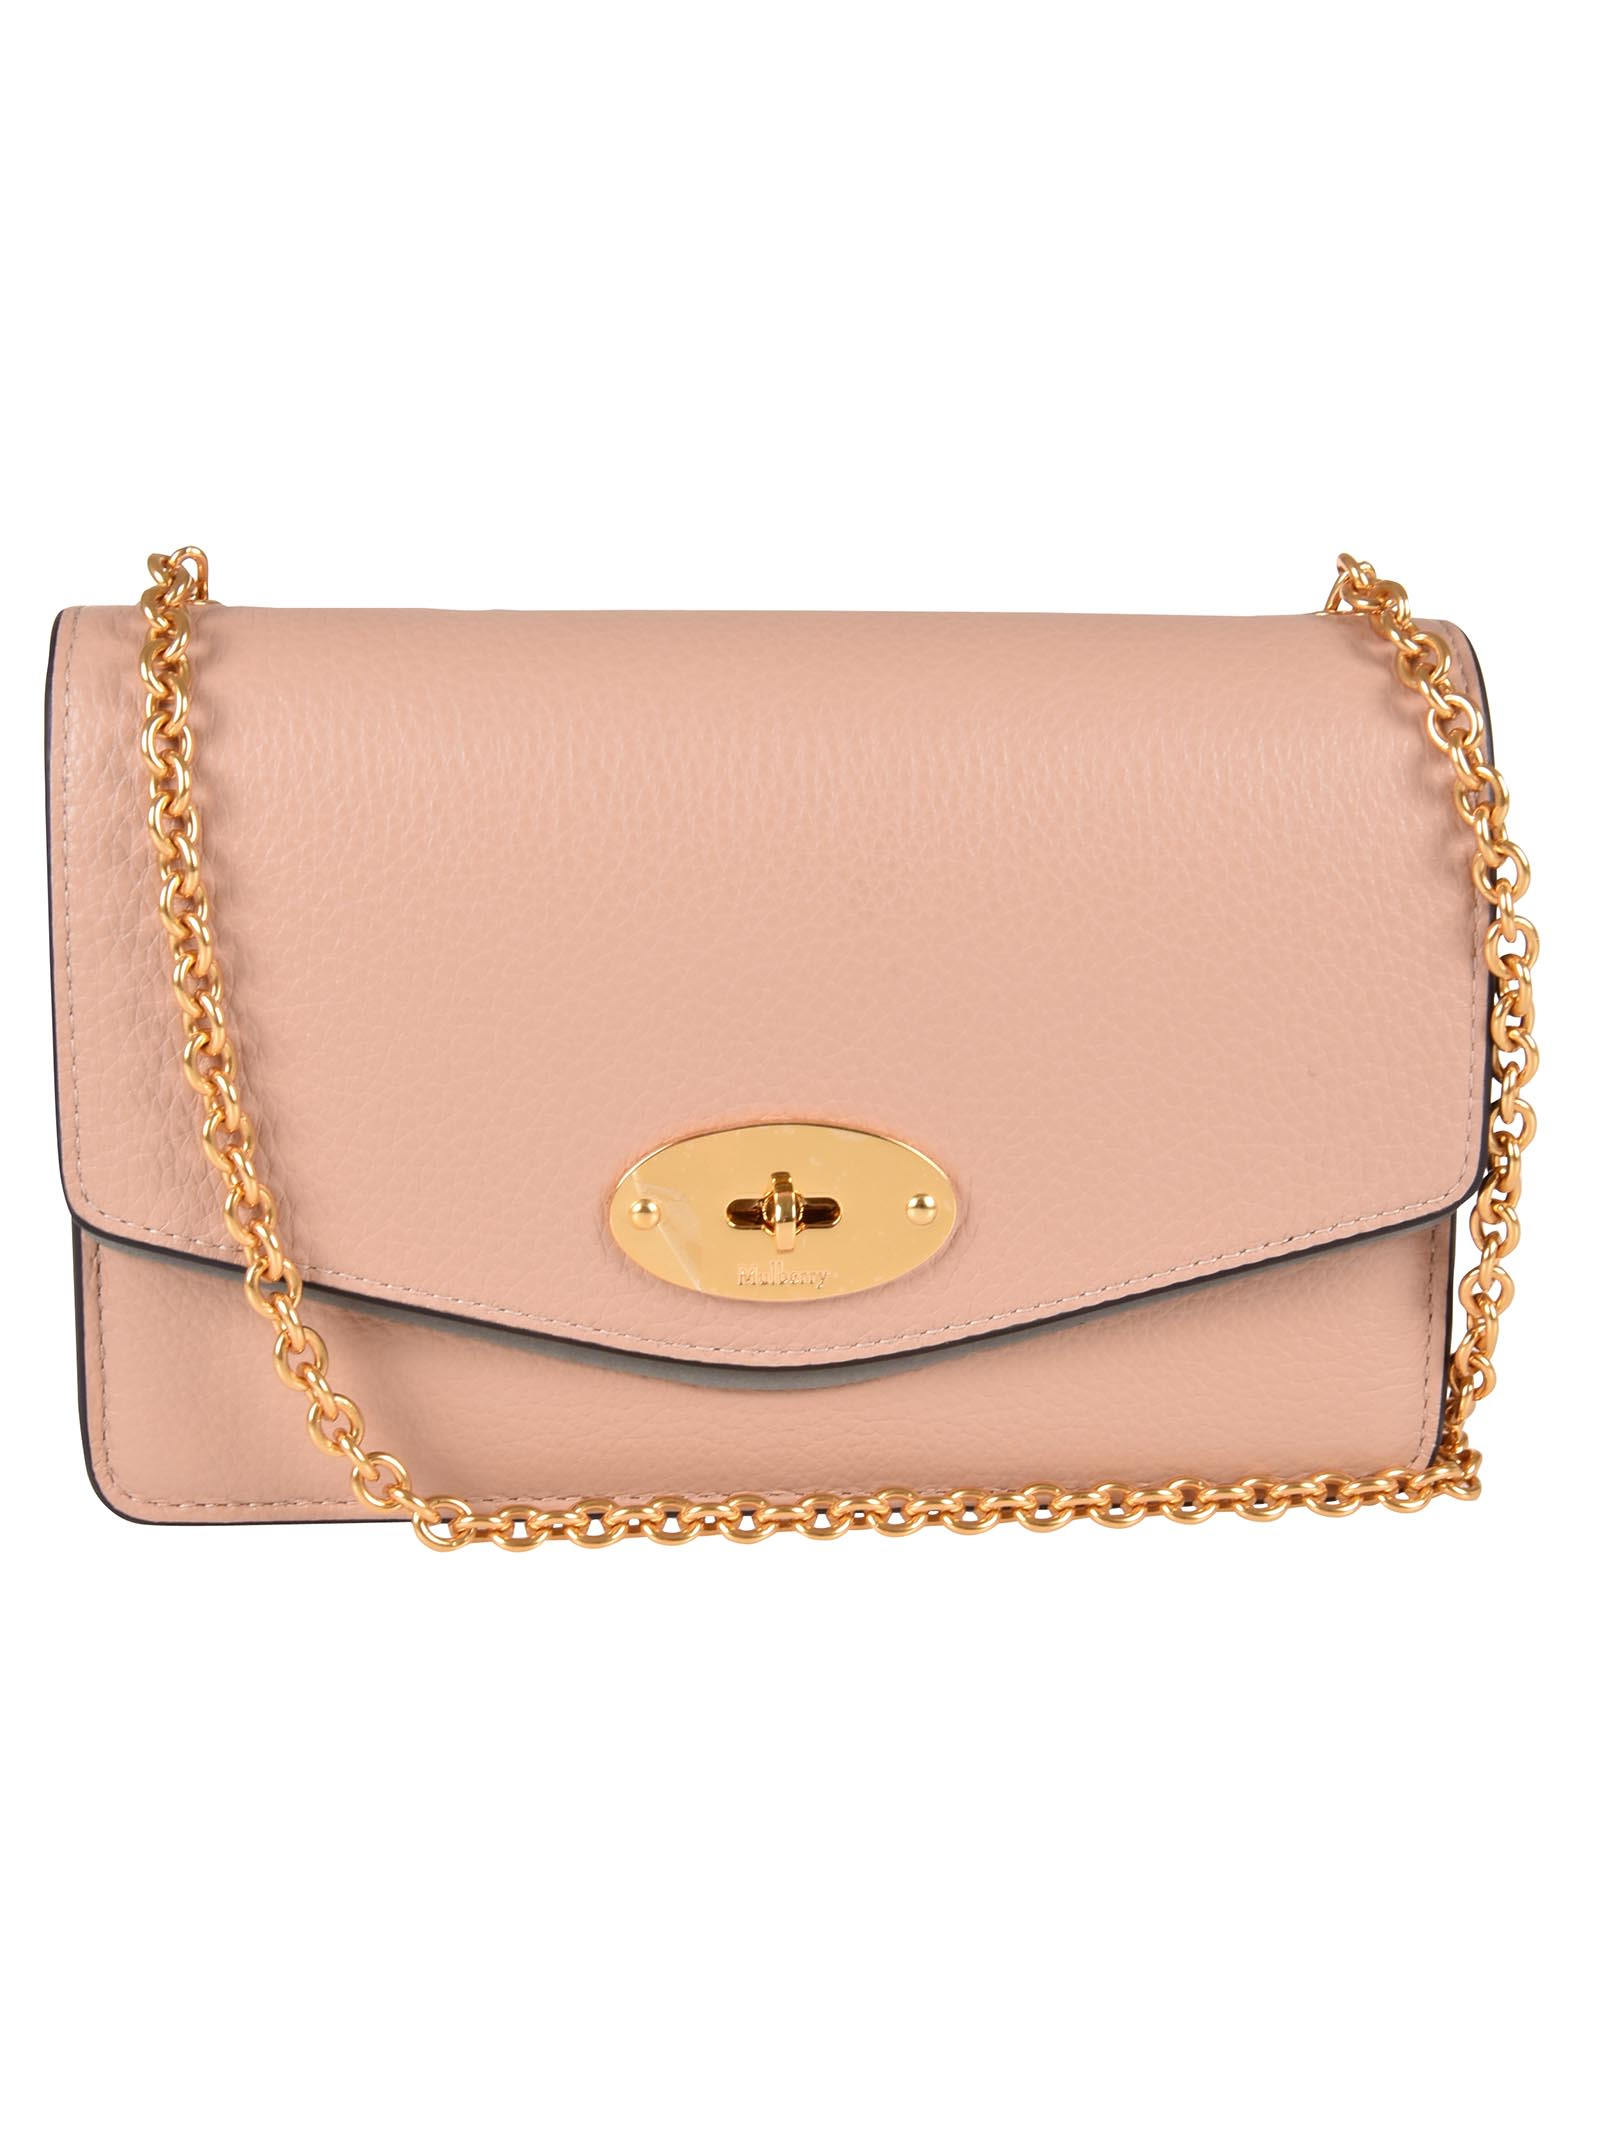 427b262b78eb Mulberry Small Darley Shoulder Bag In Jrosewater